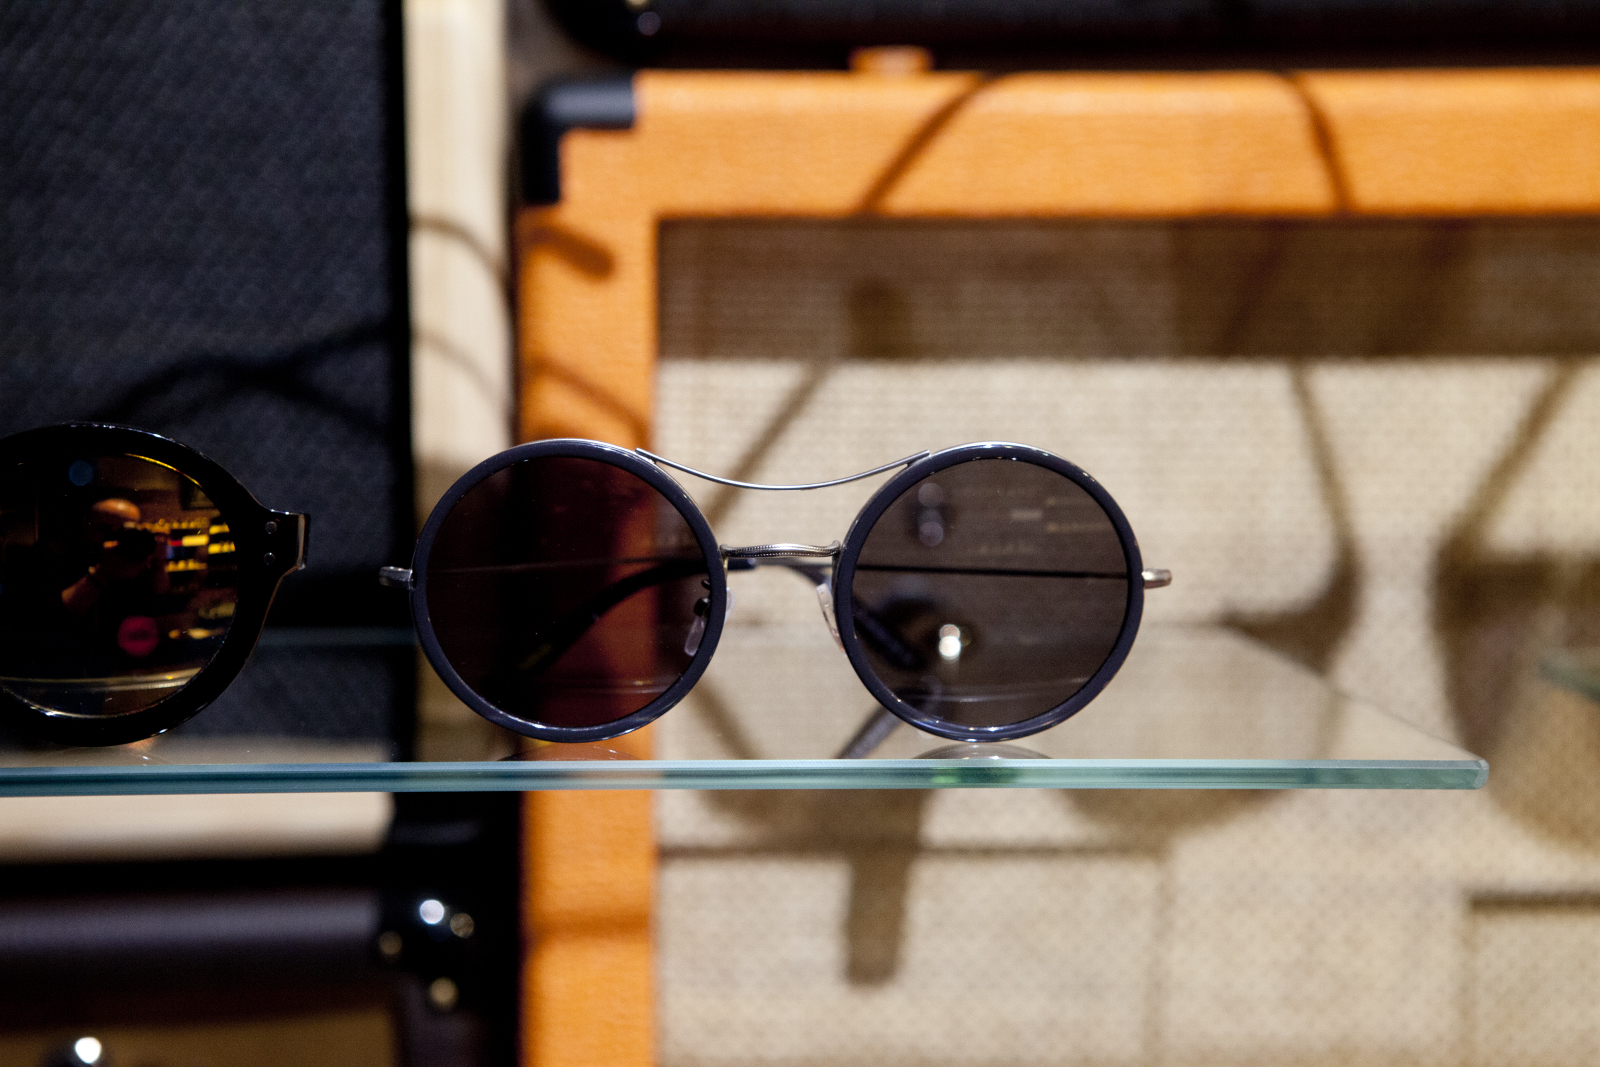 Robert_Adalierd_Rob_Design_Furniture_Wilde_sunglasses_19.jpg